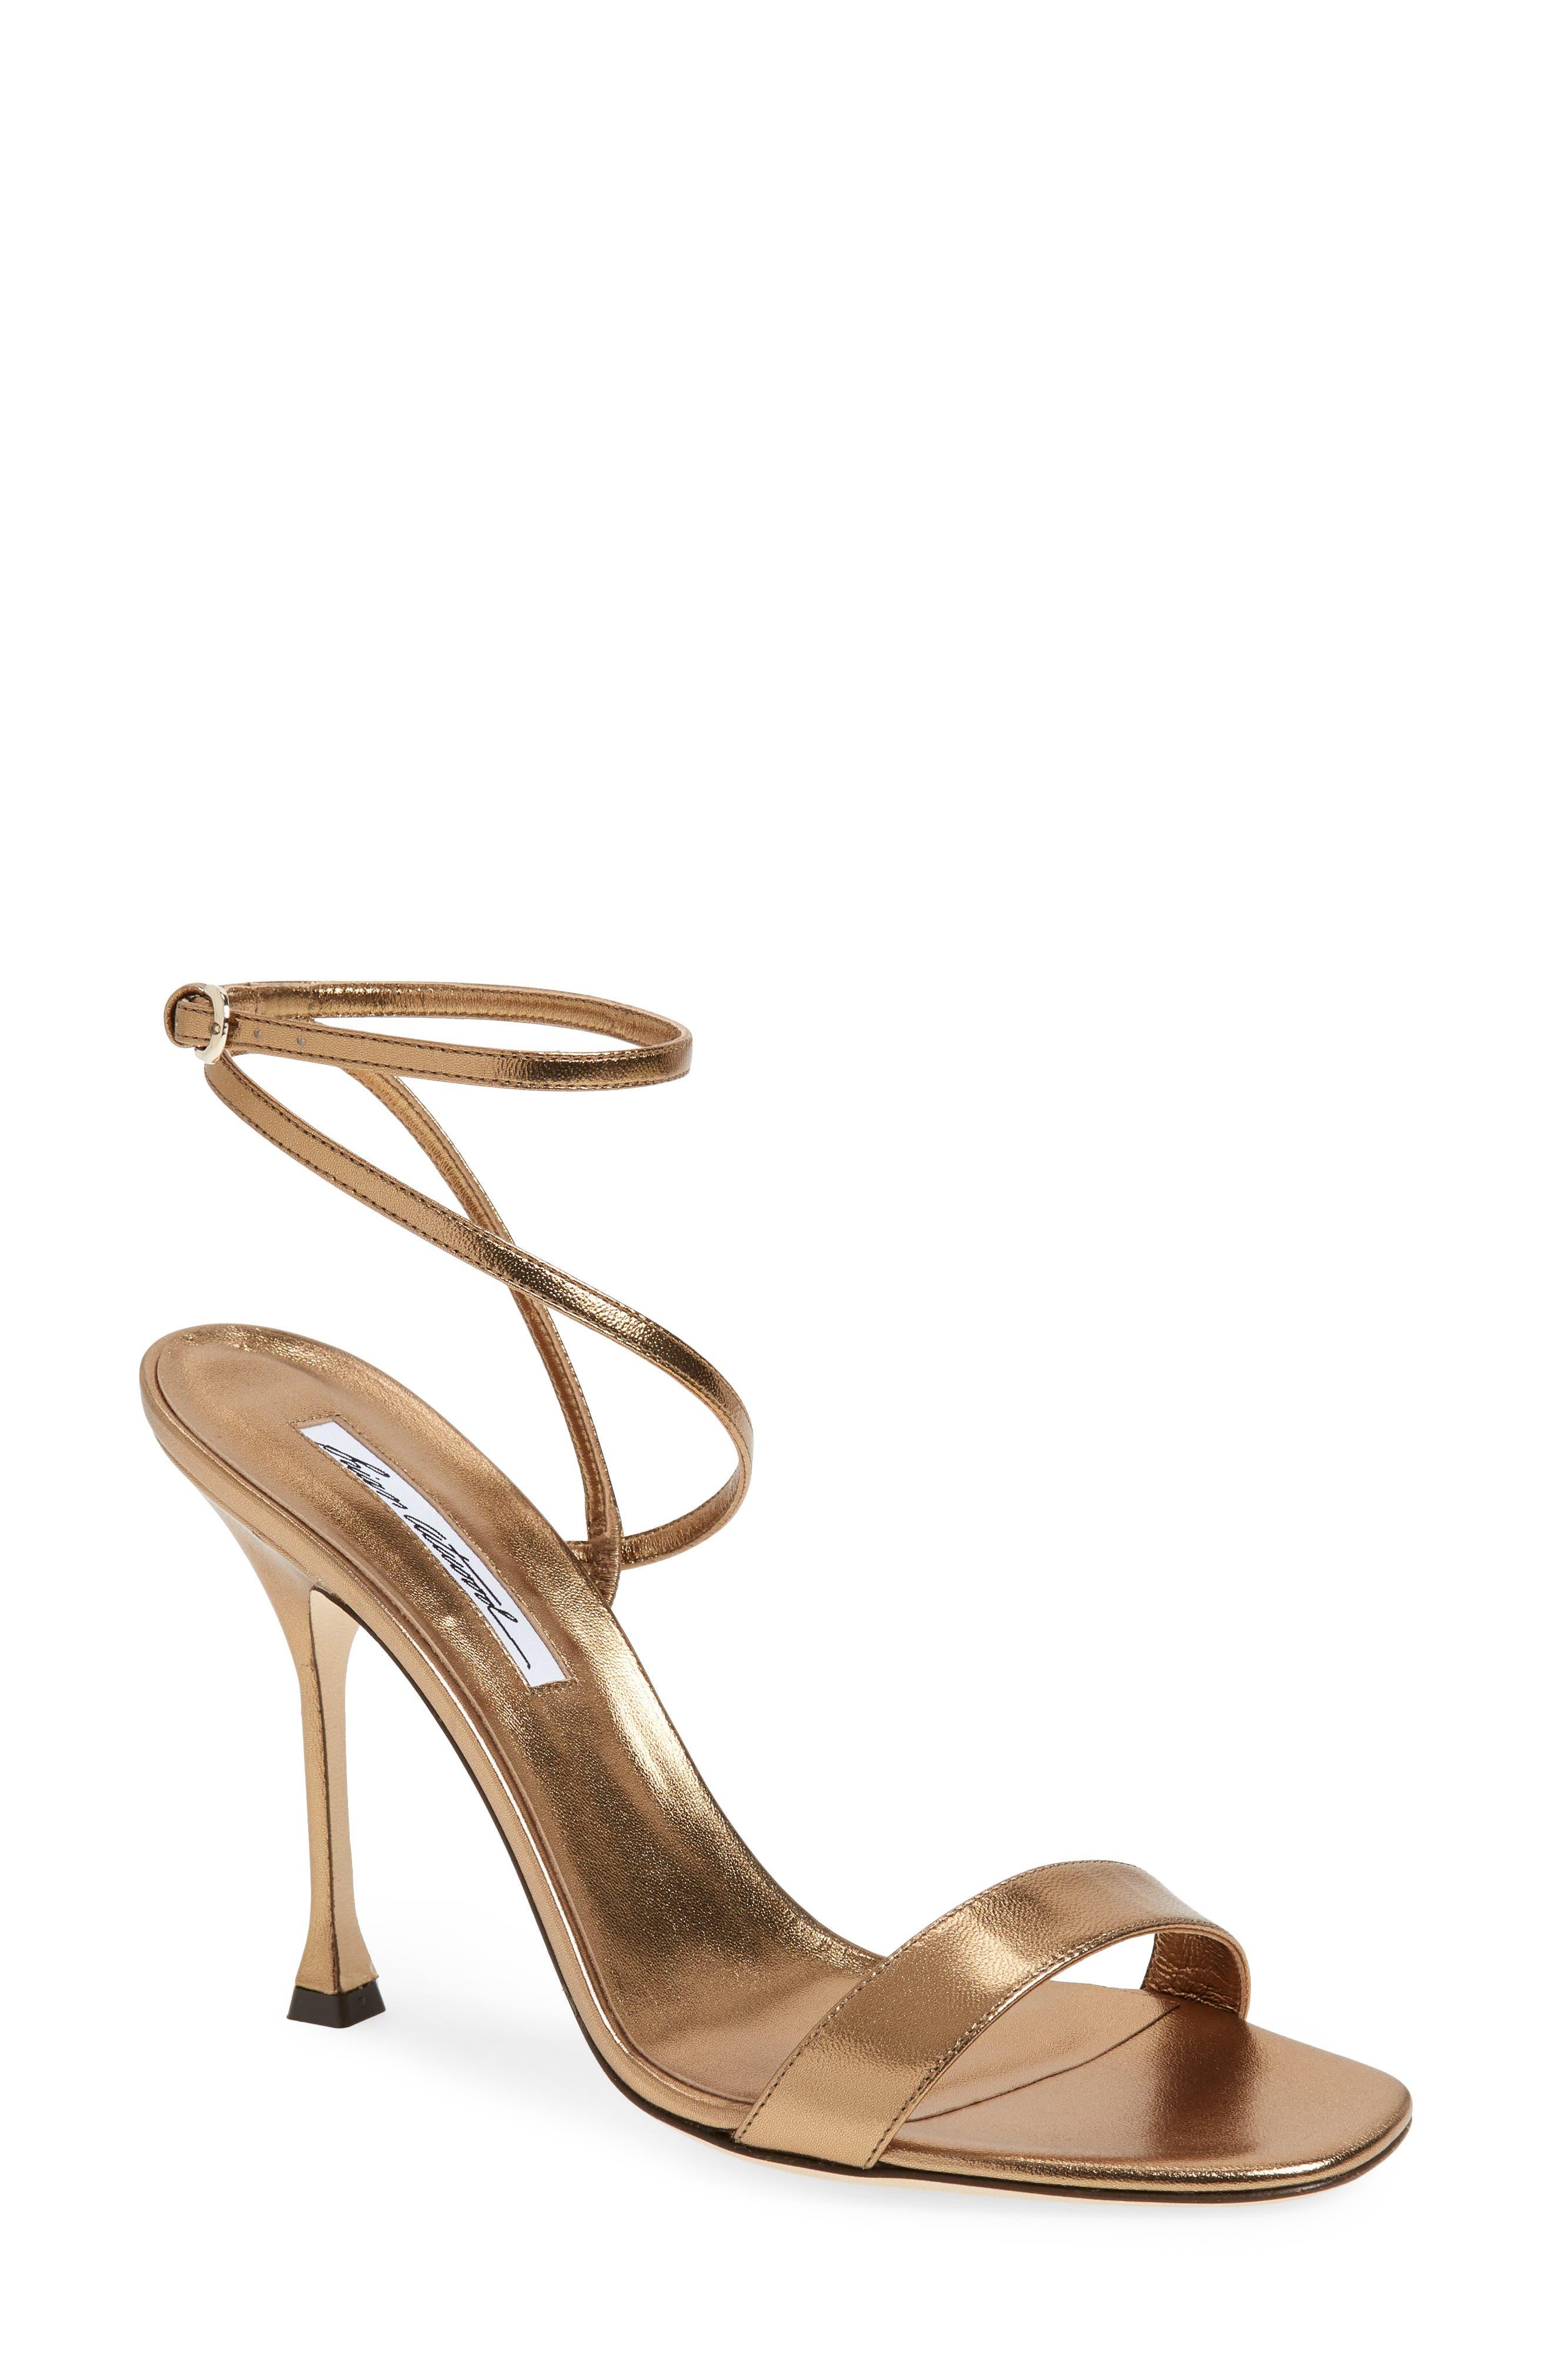 Sienna Ankle Strap Sandal,                         Main,                         color, Bronze Metal Nappa